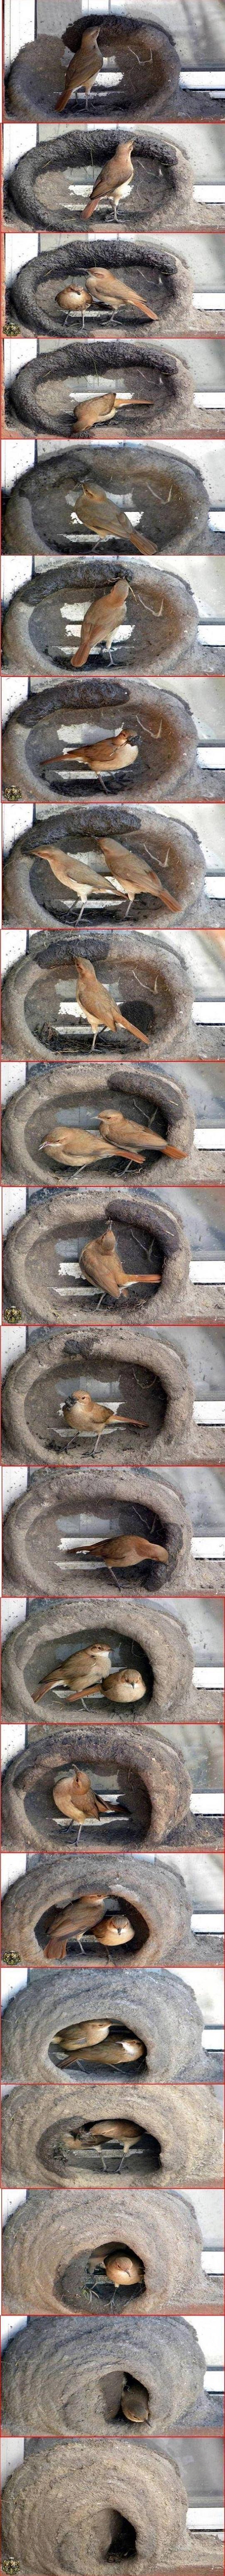 Как птицы строят гнезда